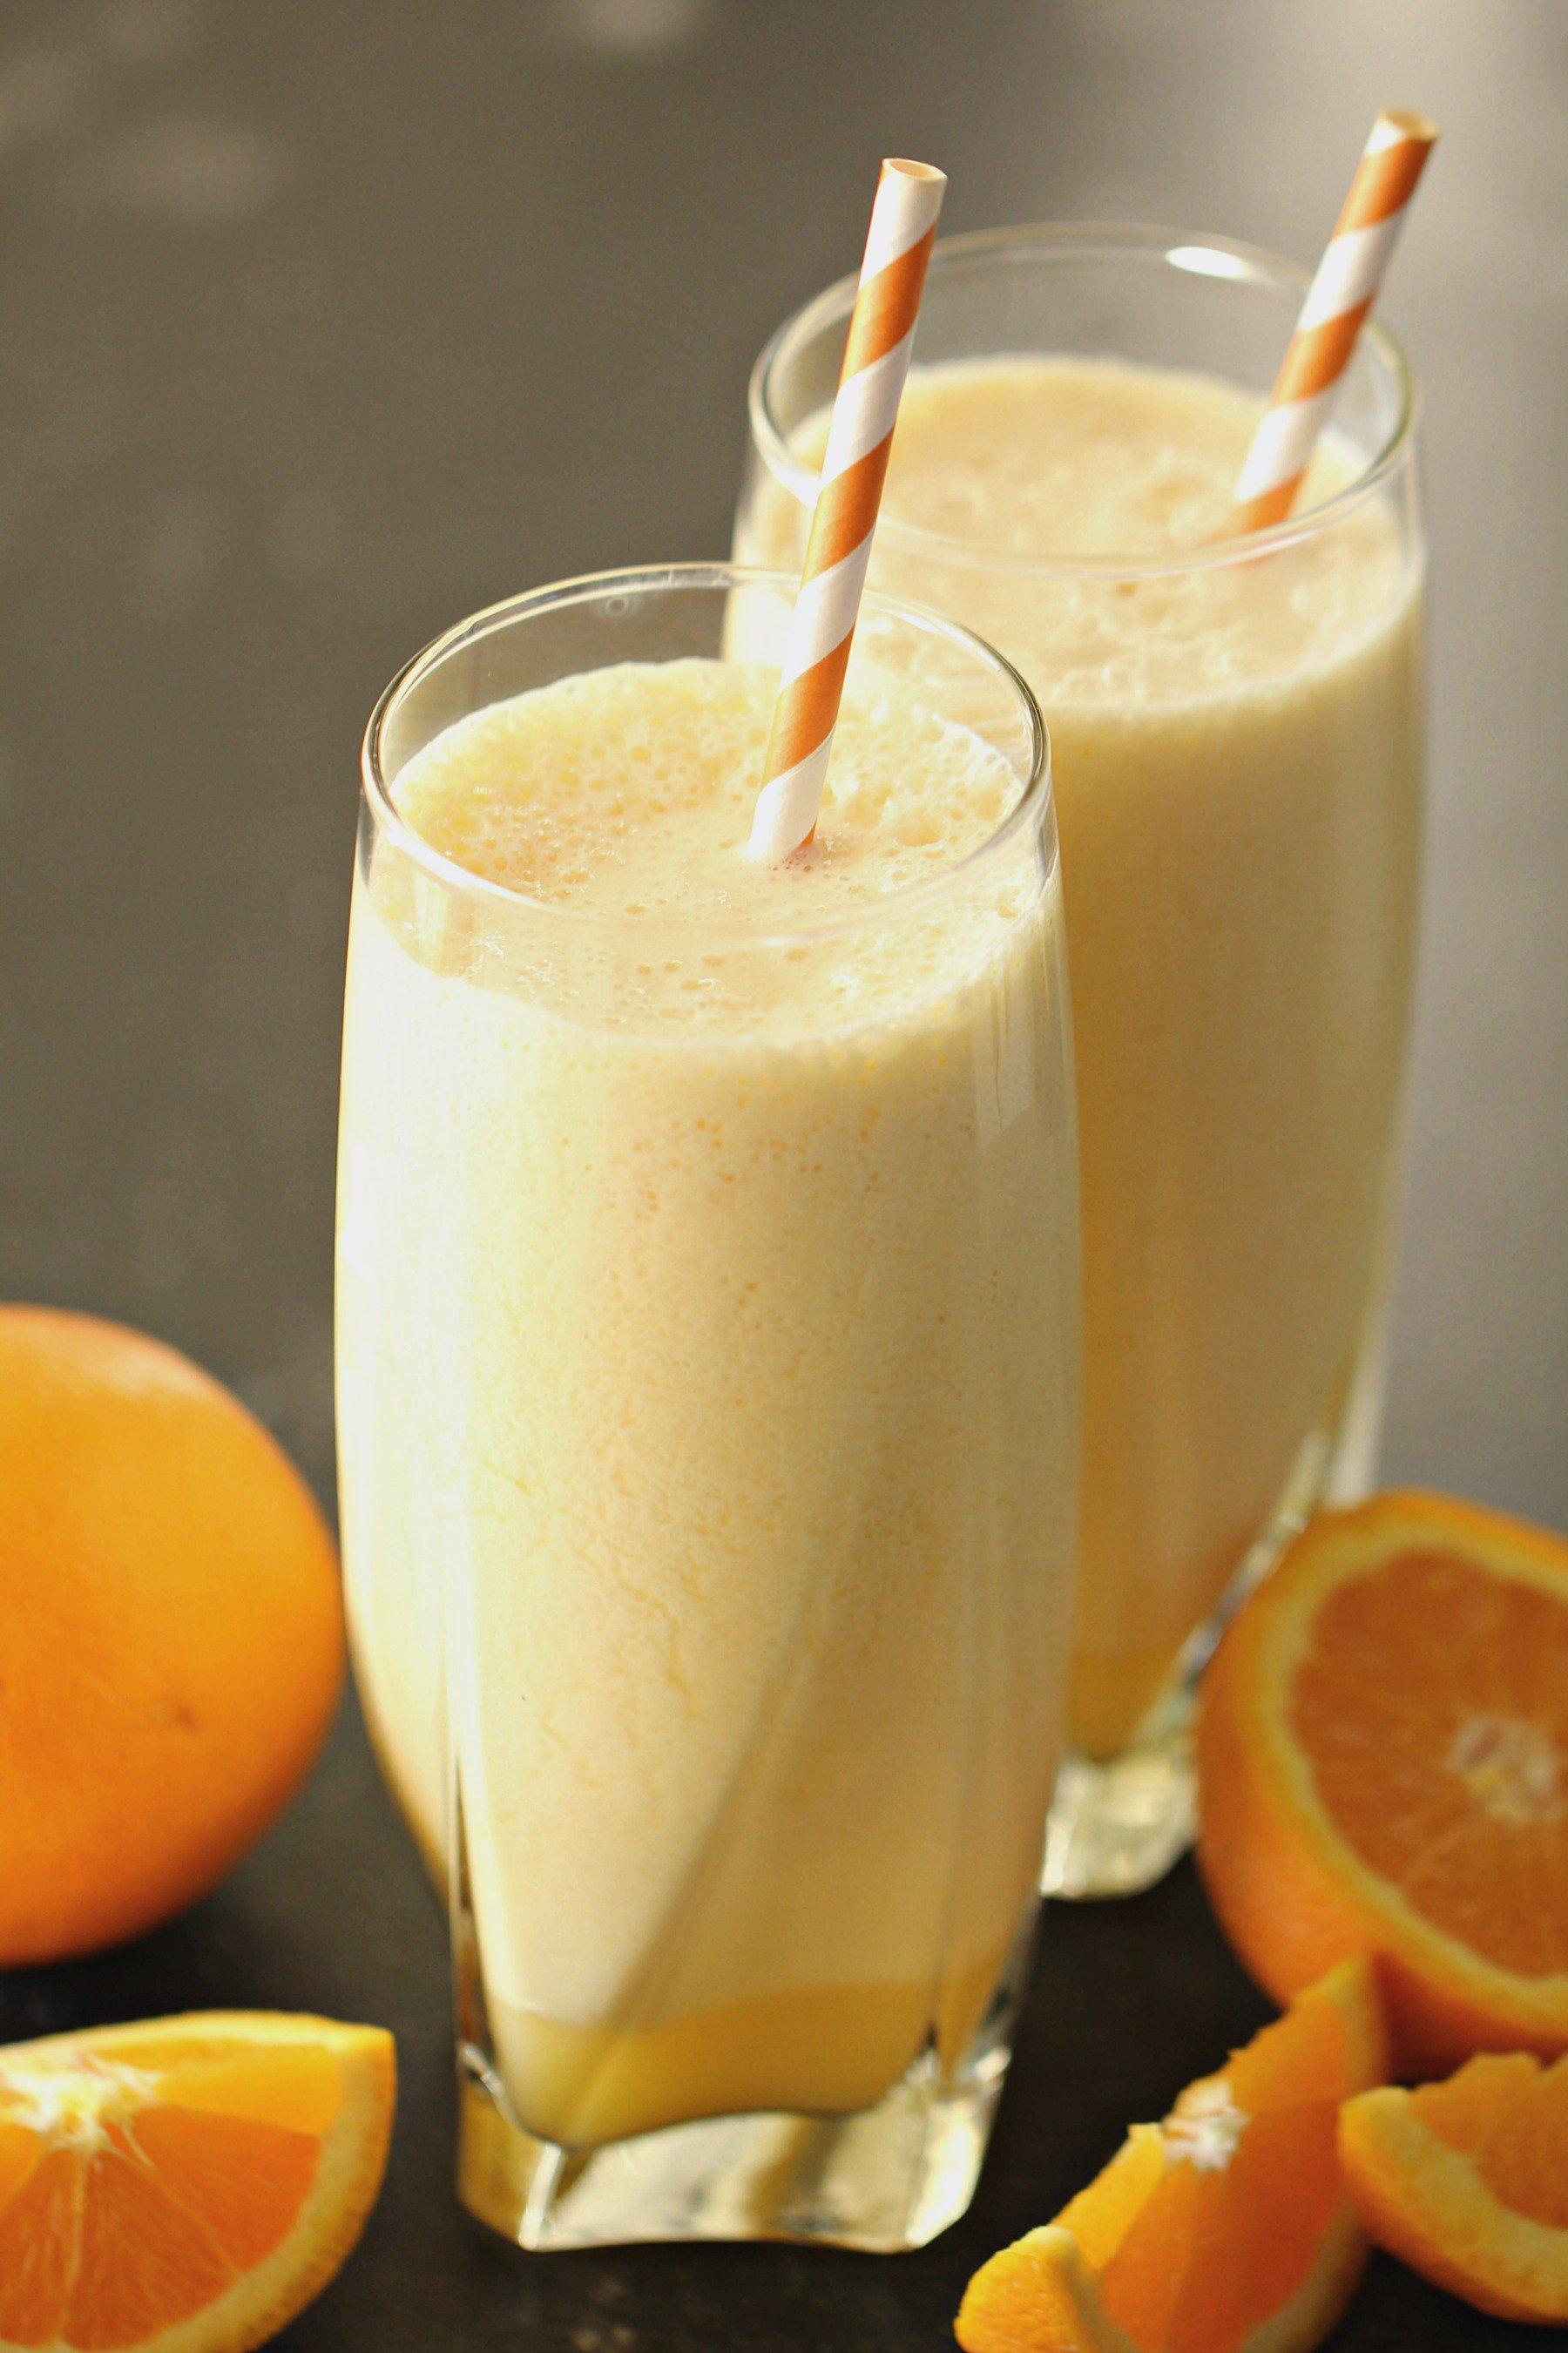 Healthier Orange Julius Copycat with Banana